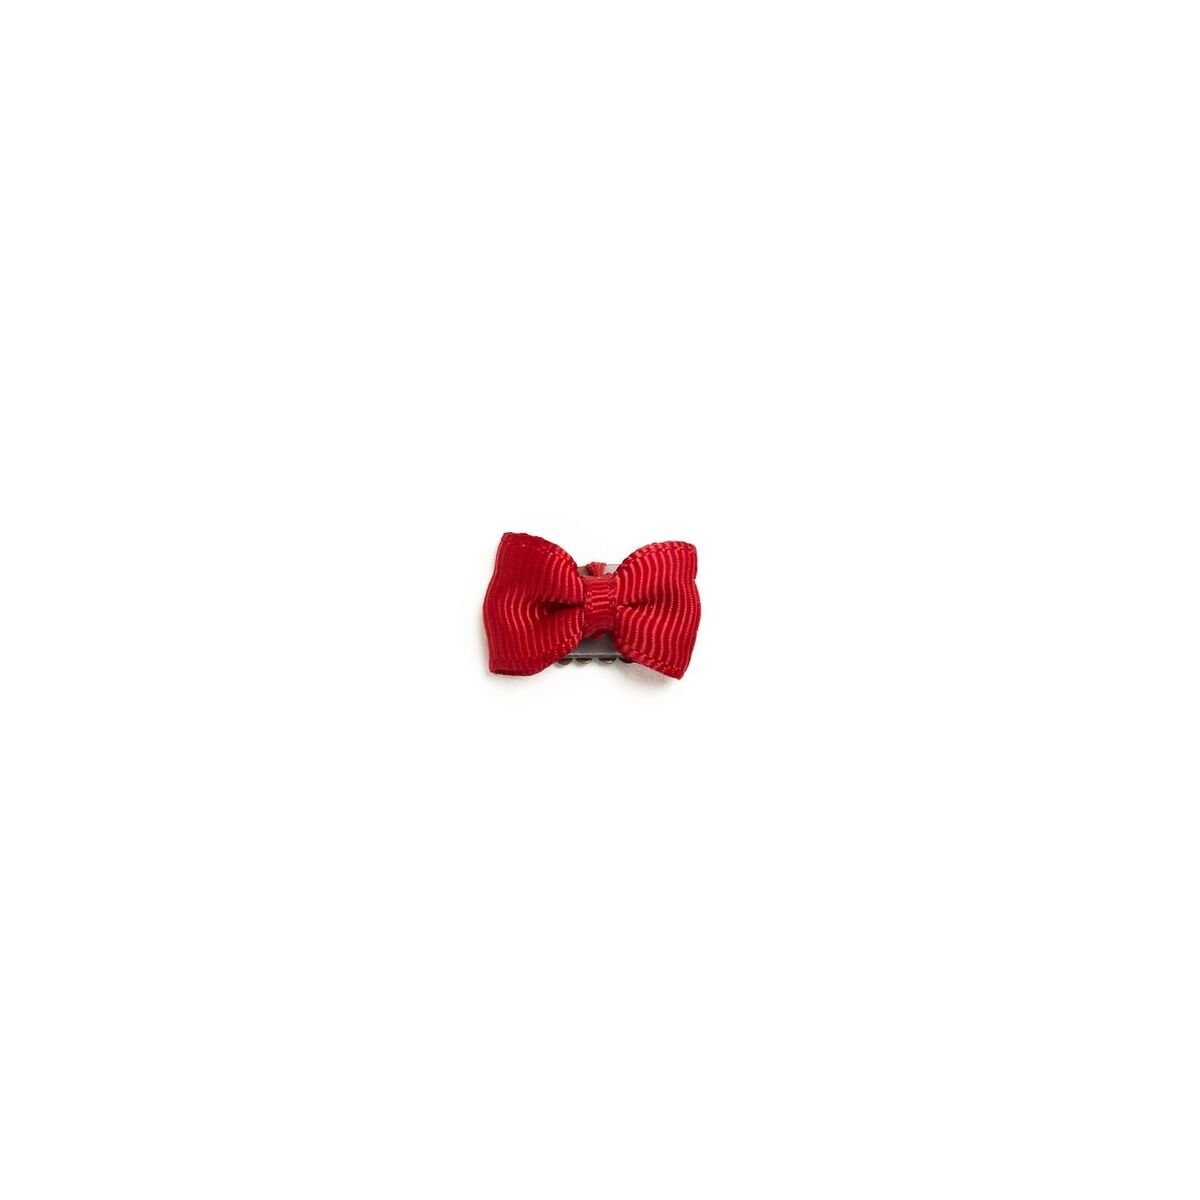 Baby Wisp Mini Infant Hair Bow Wisp Clip Grosgrain Baby Bow Girls Fine Hair Accessory Red BW1310